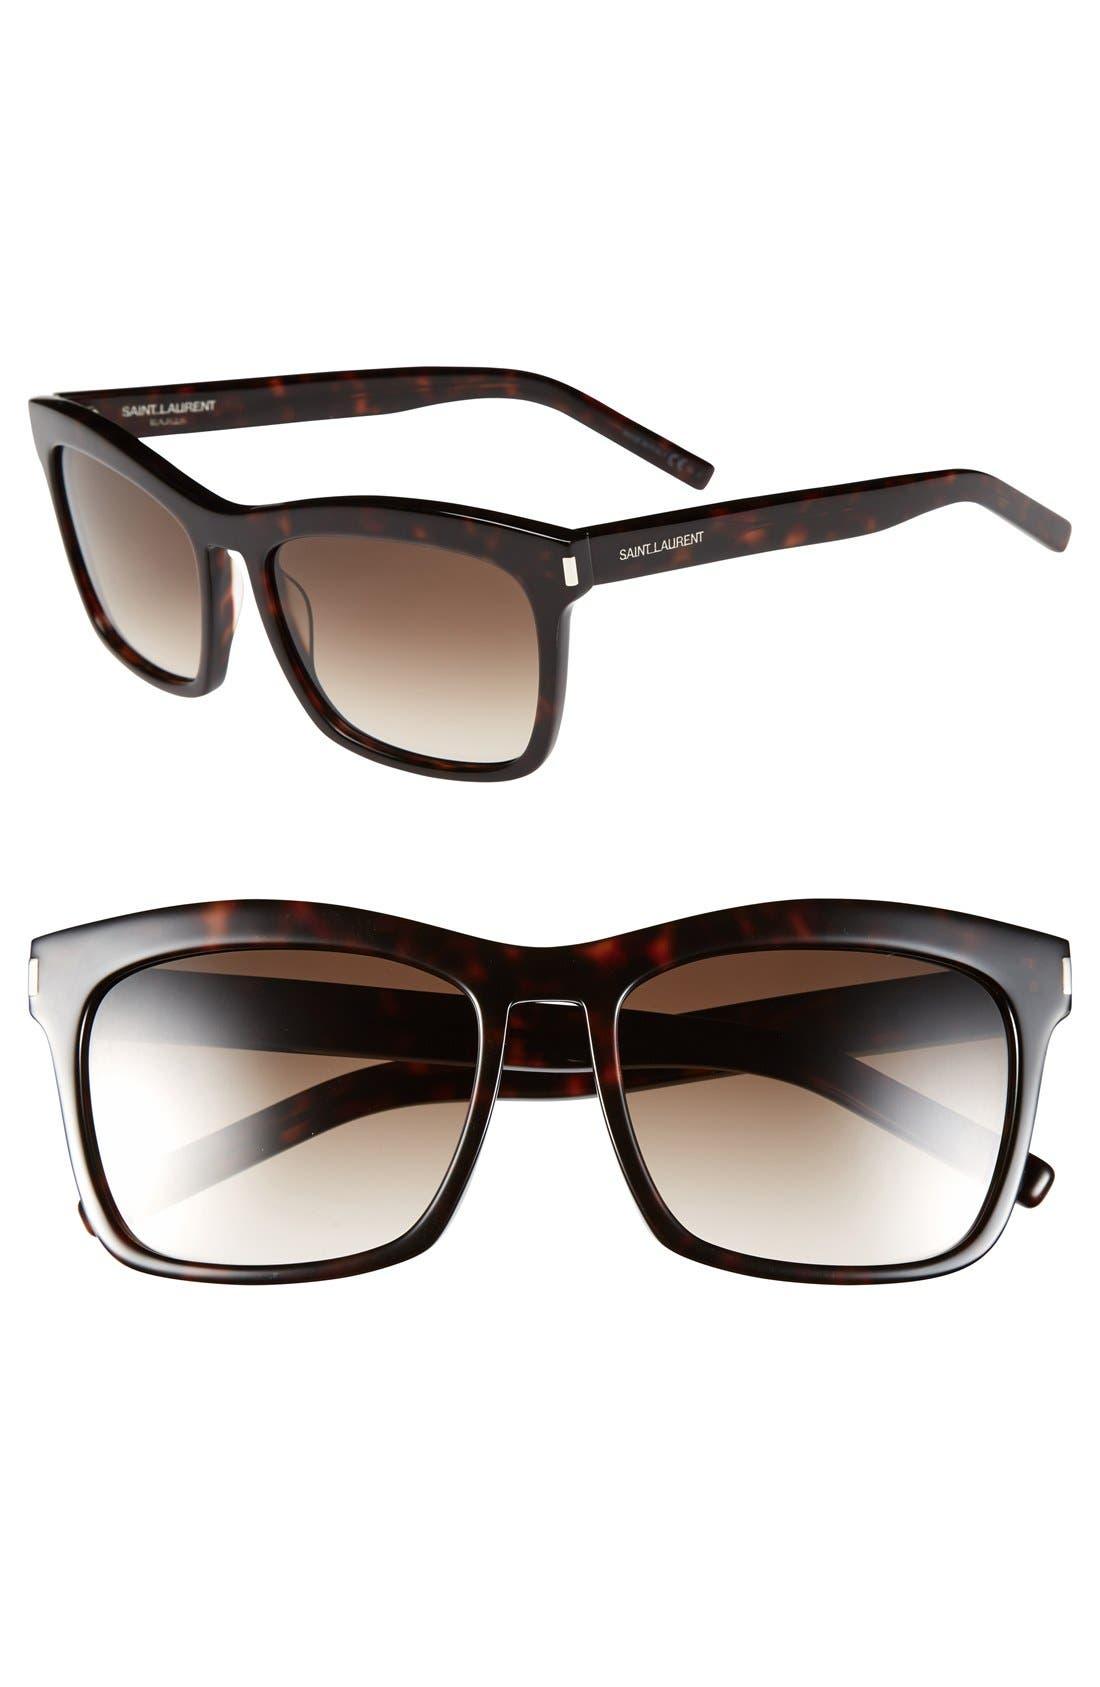 Alternate Image 1 Selected - Saint Laurent 56mm Retro Sunglasses